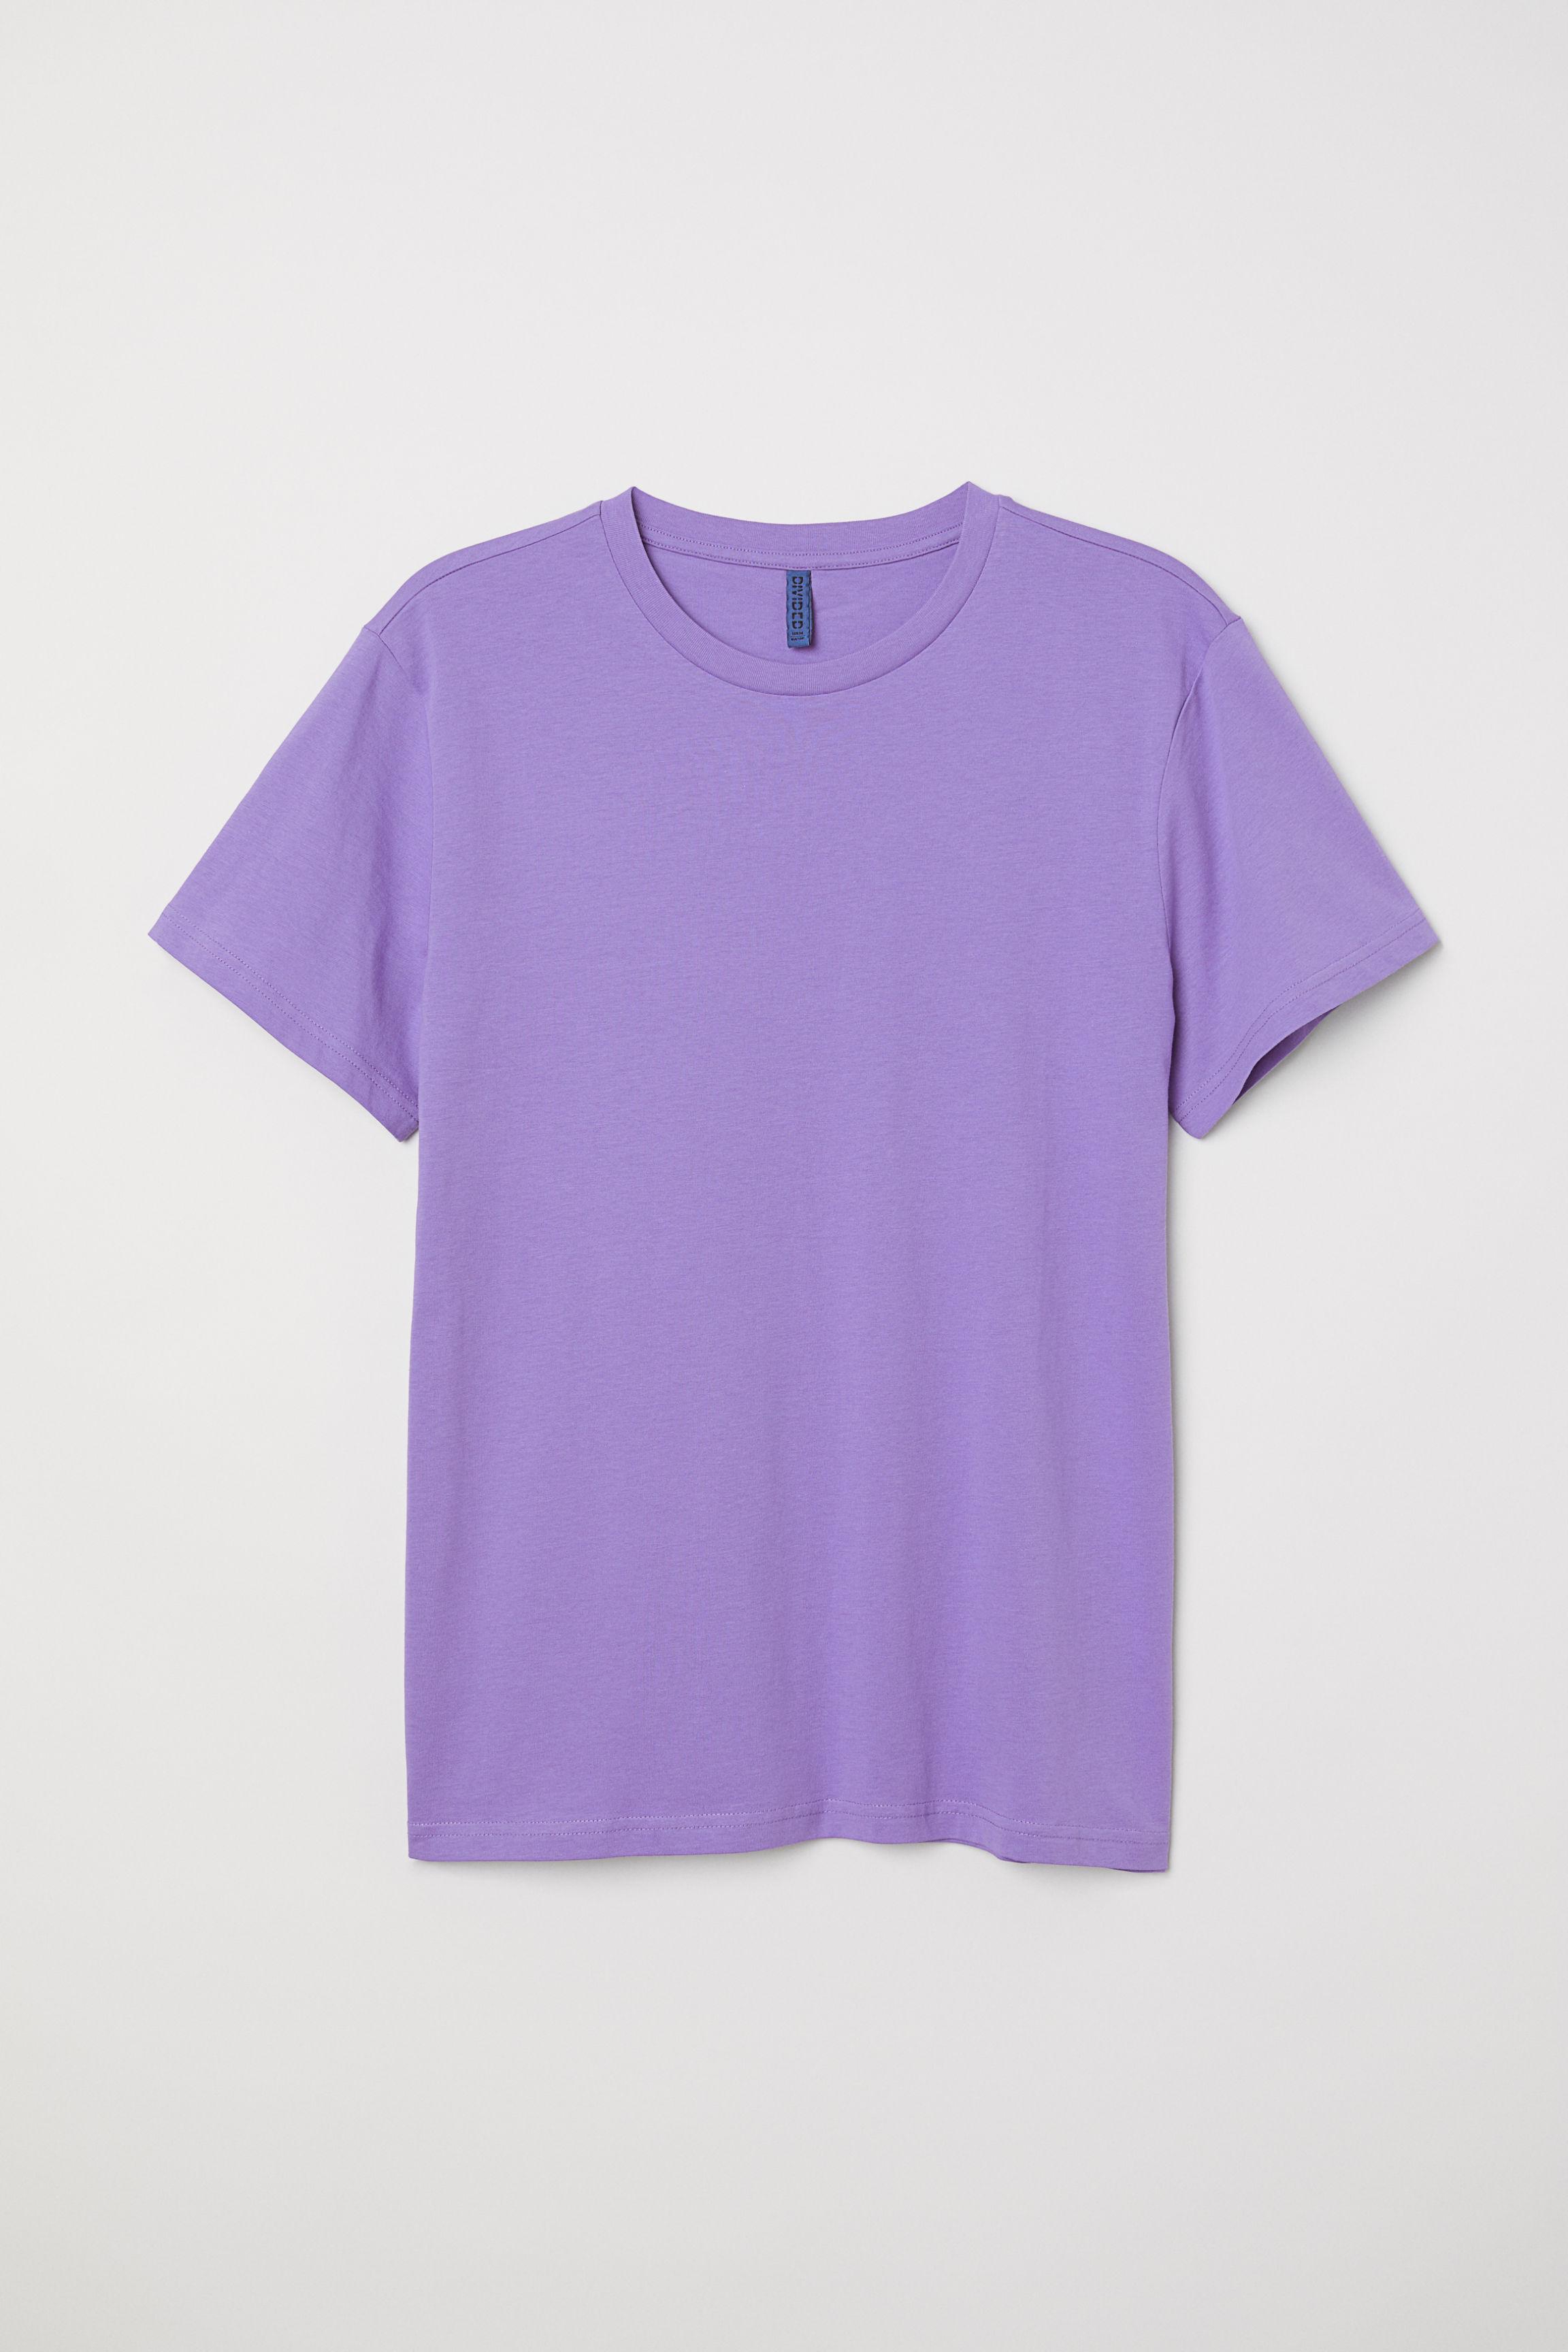 f0d4abed Round-necked T-shirt - Light pink - Men | H&M US